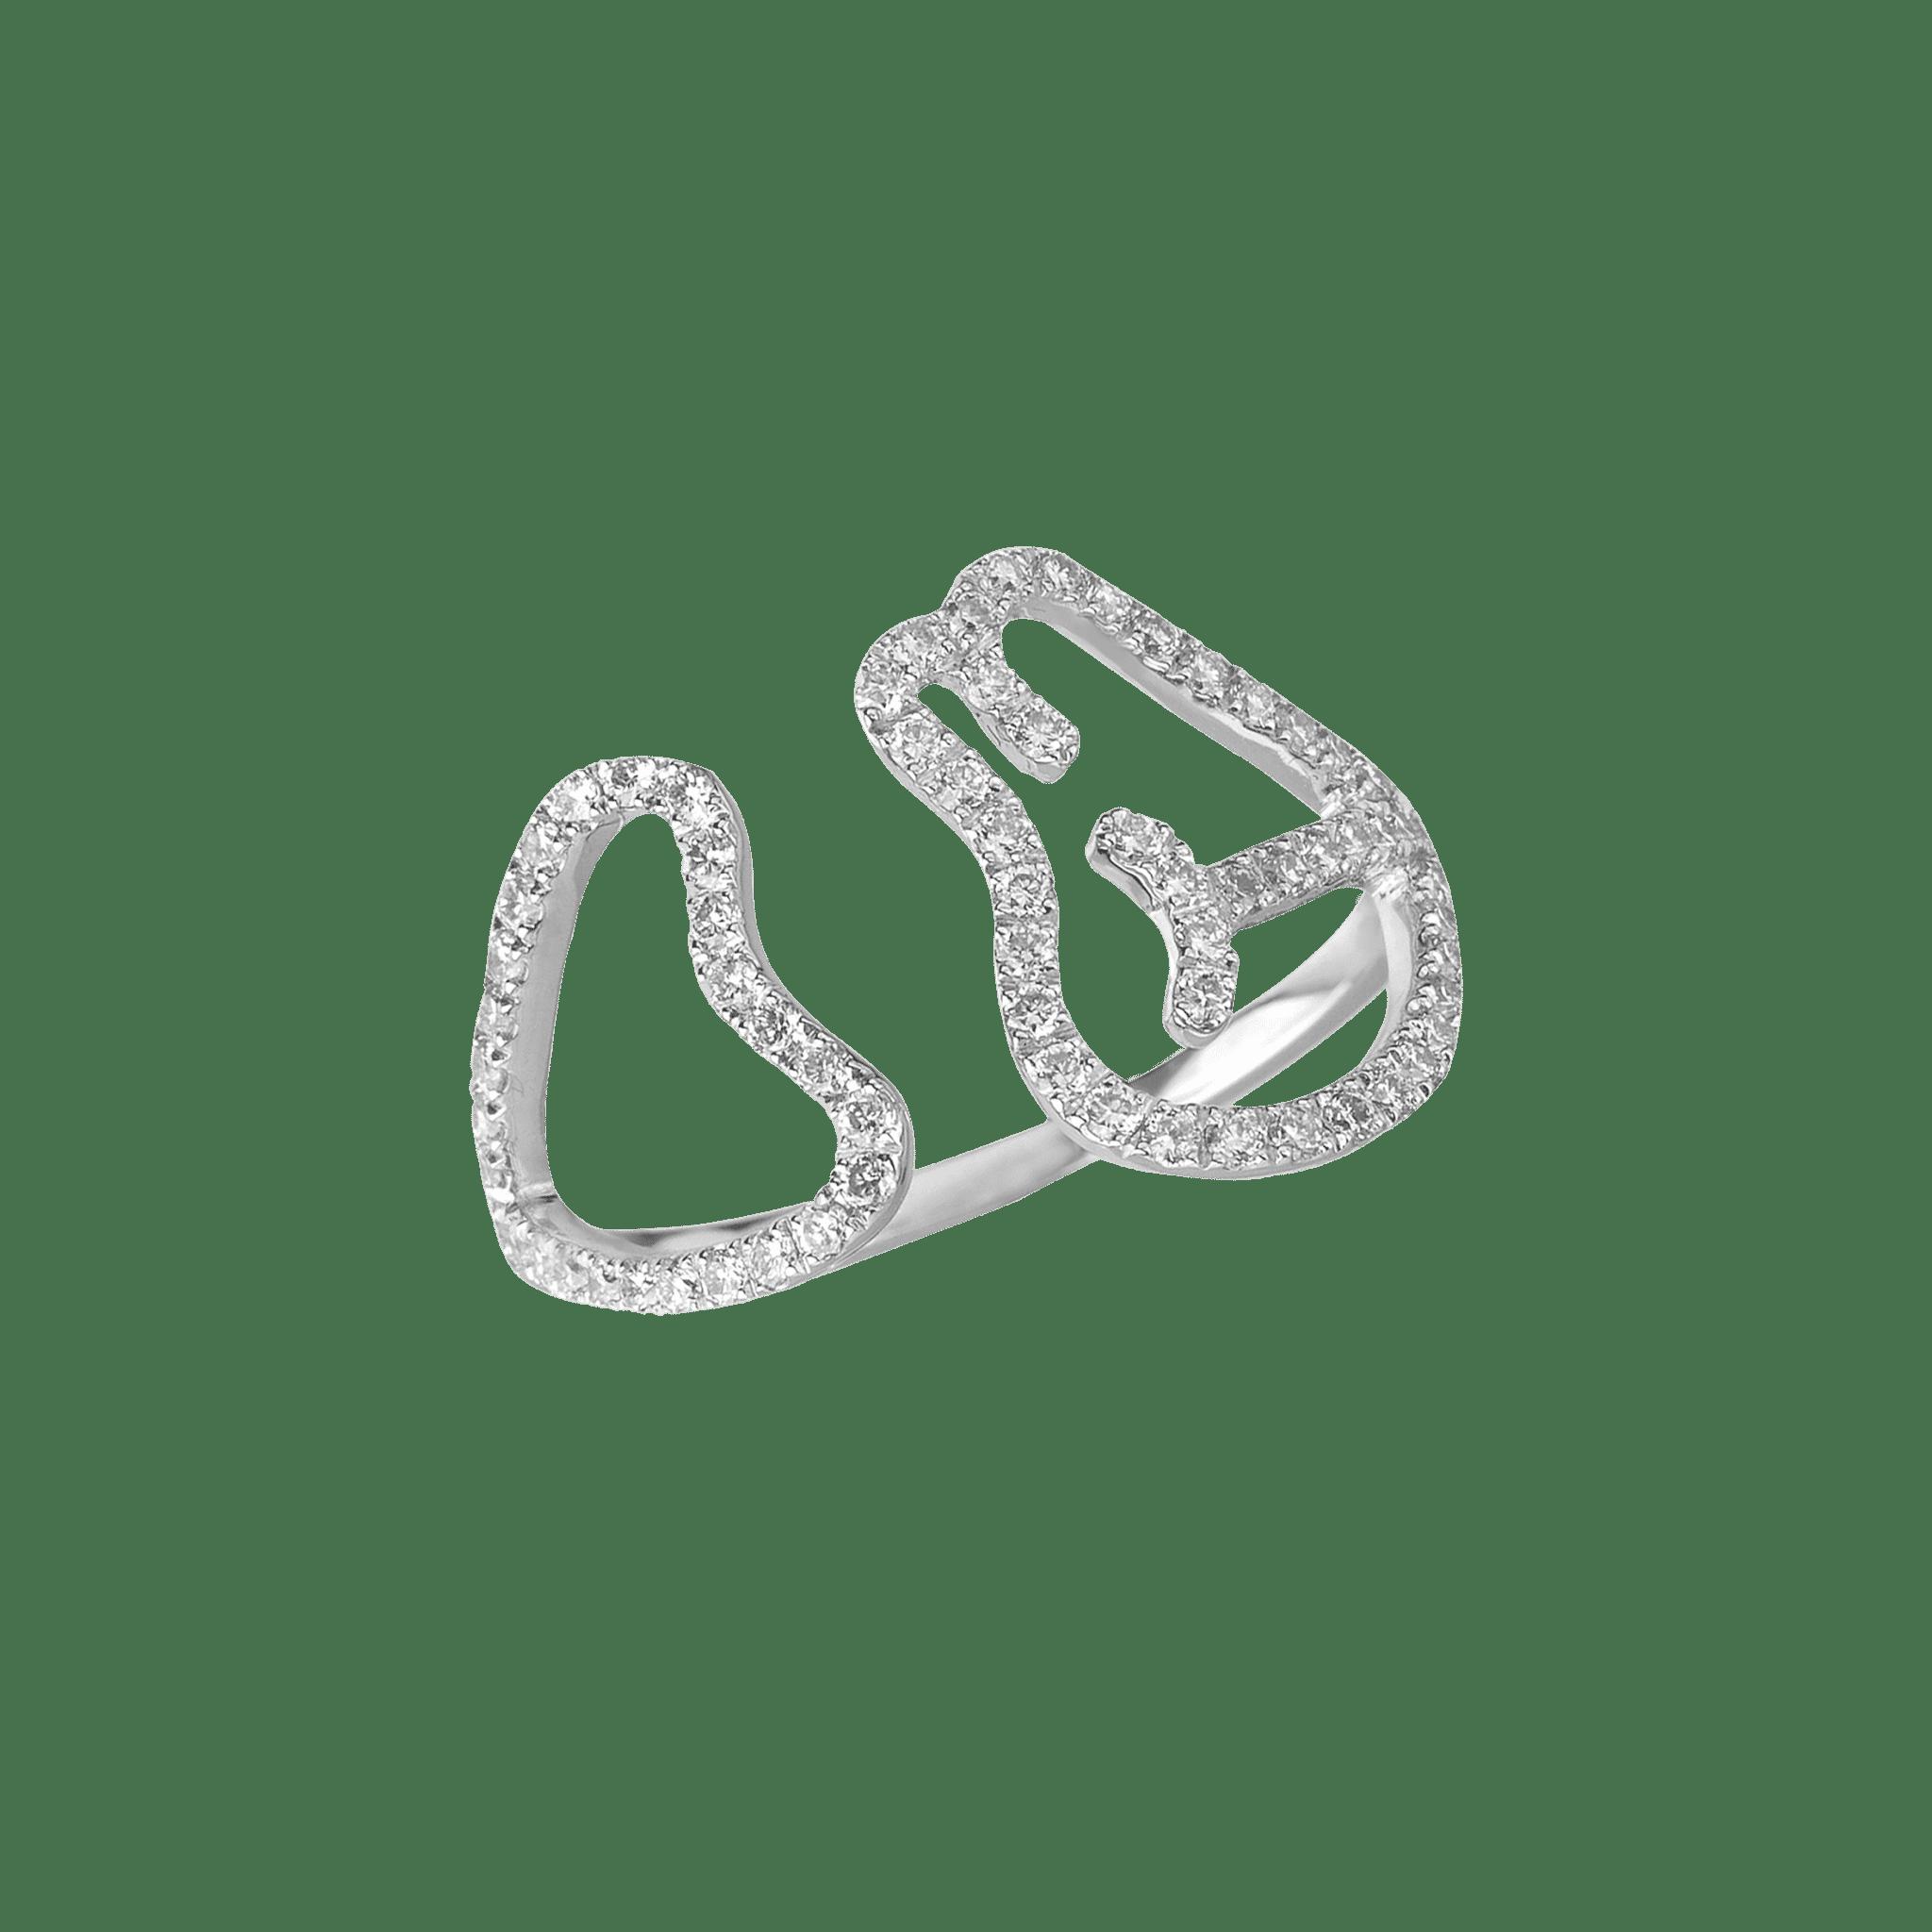 Empreinte bague or blanc diamant